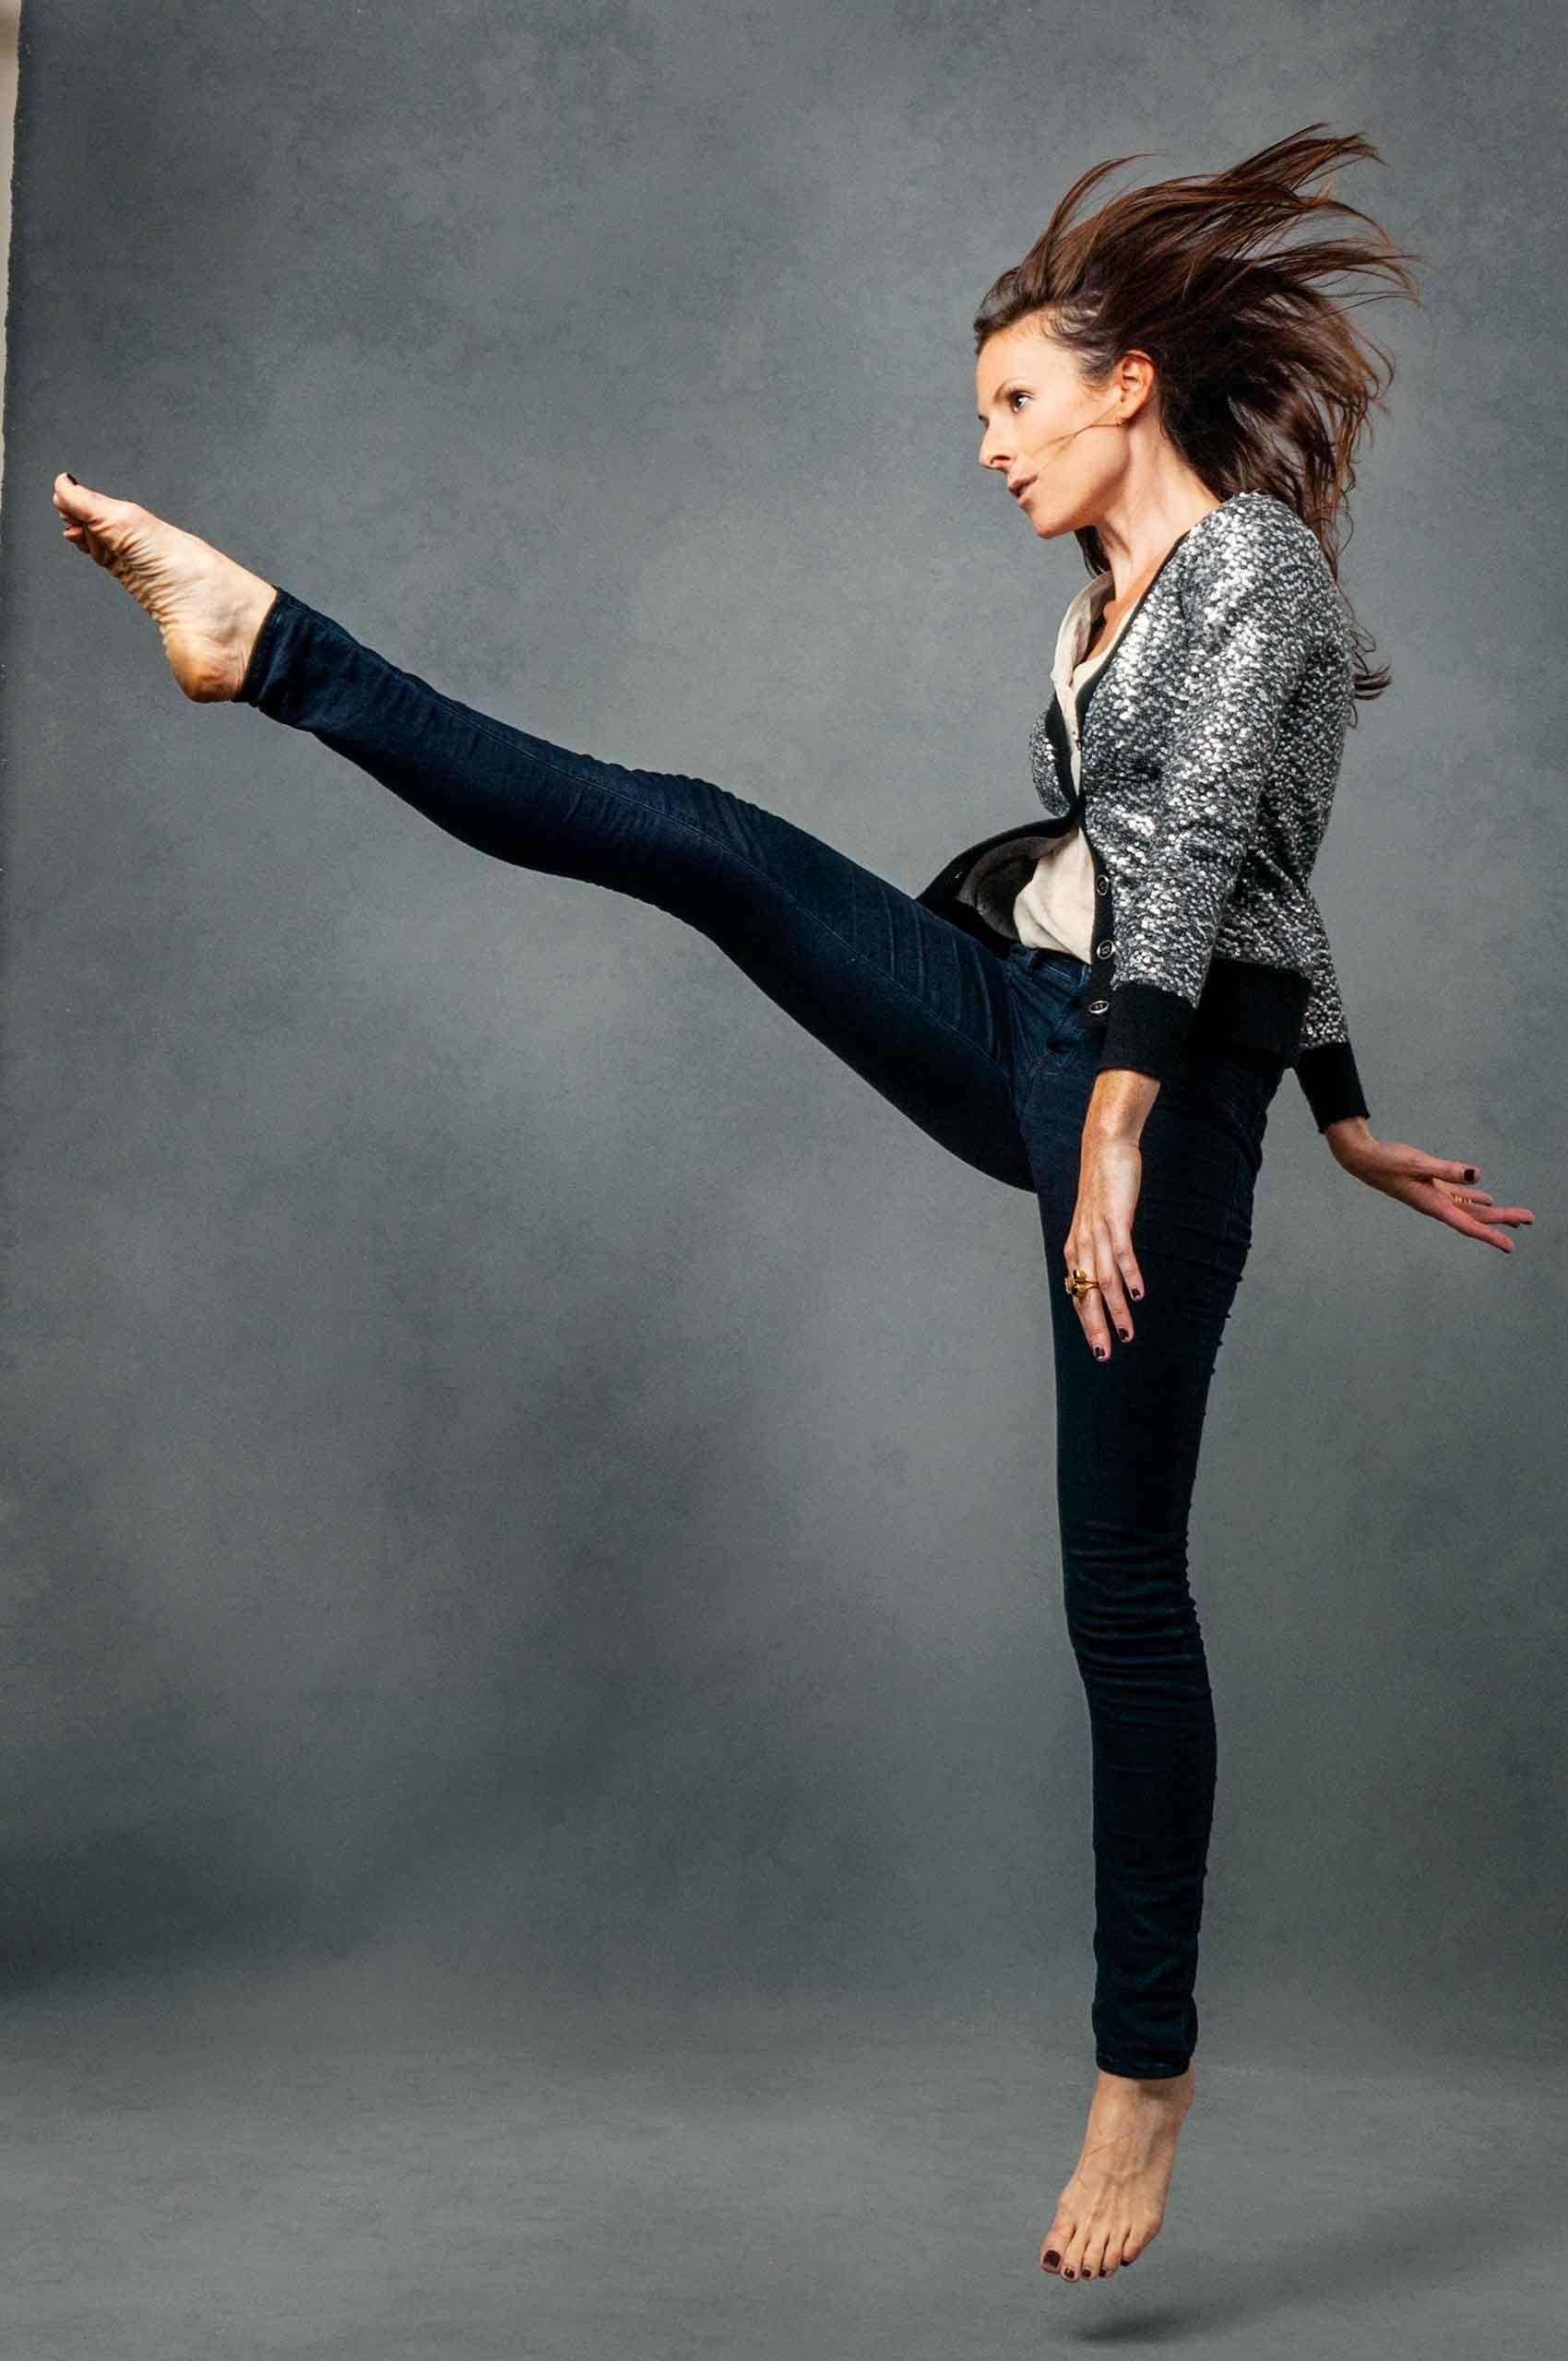 Woman-kicking-HenrikOlundPhotography.jpg